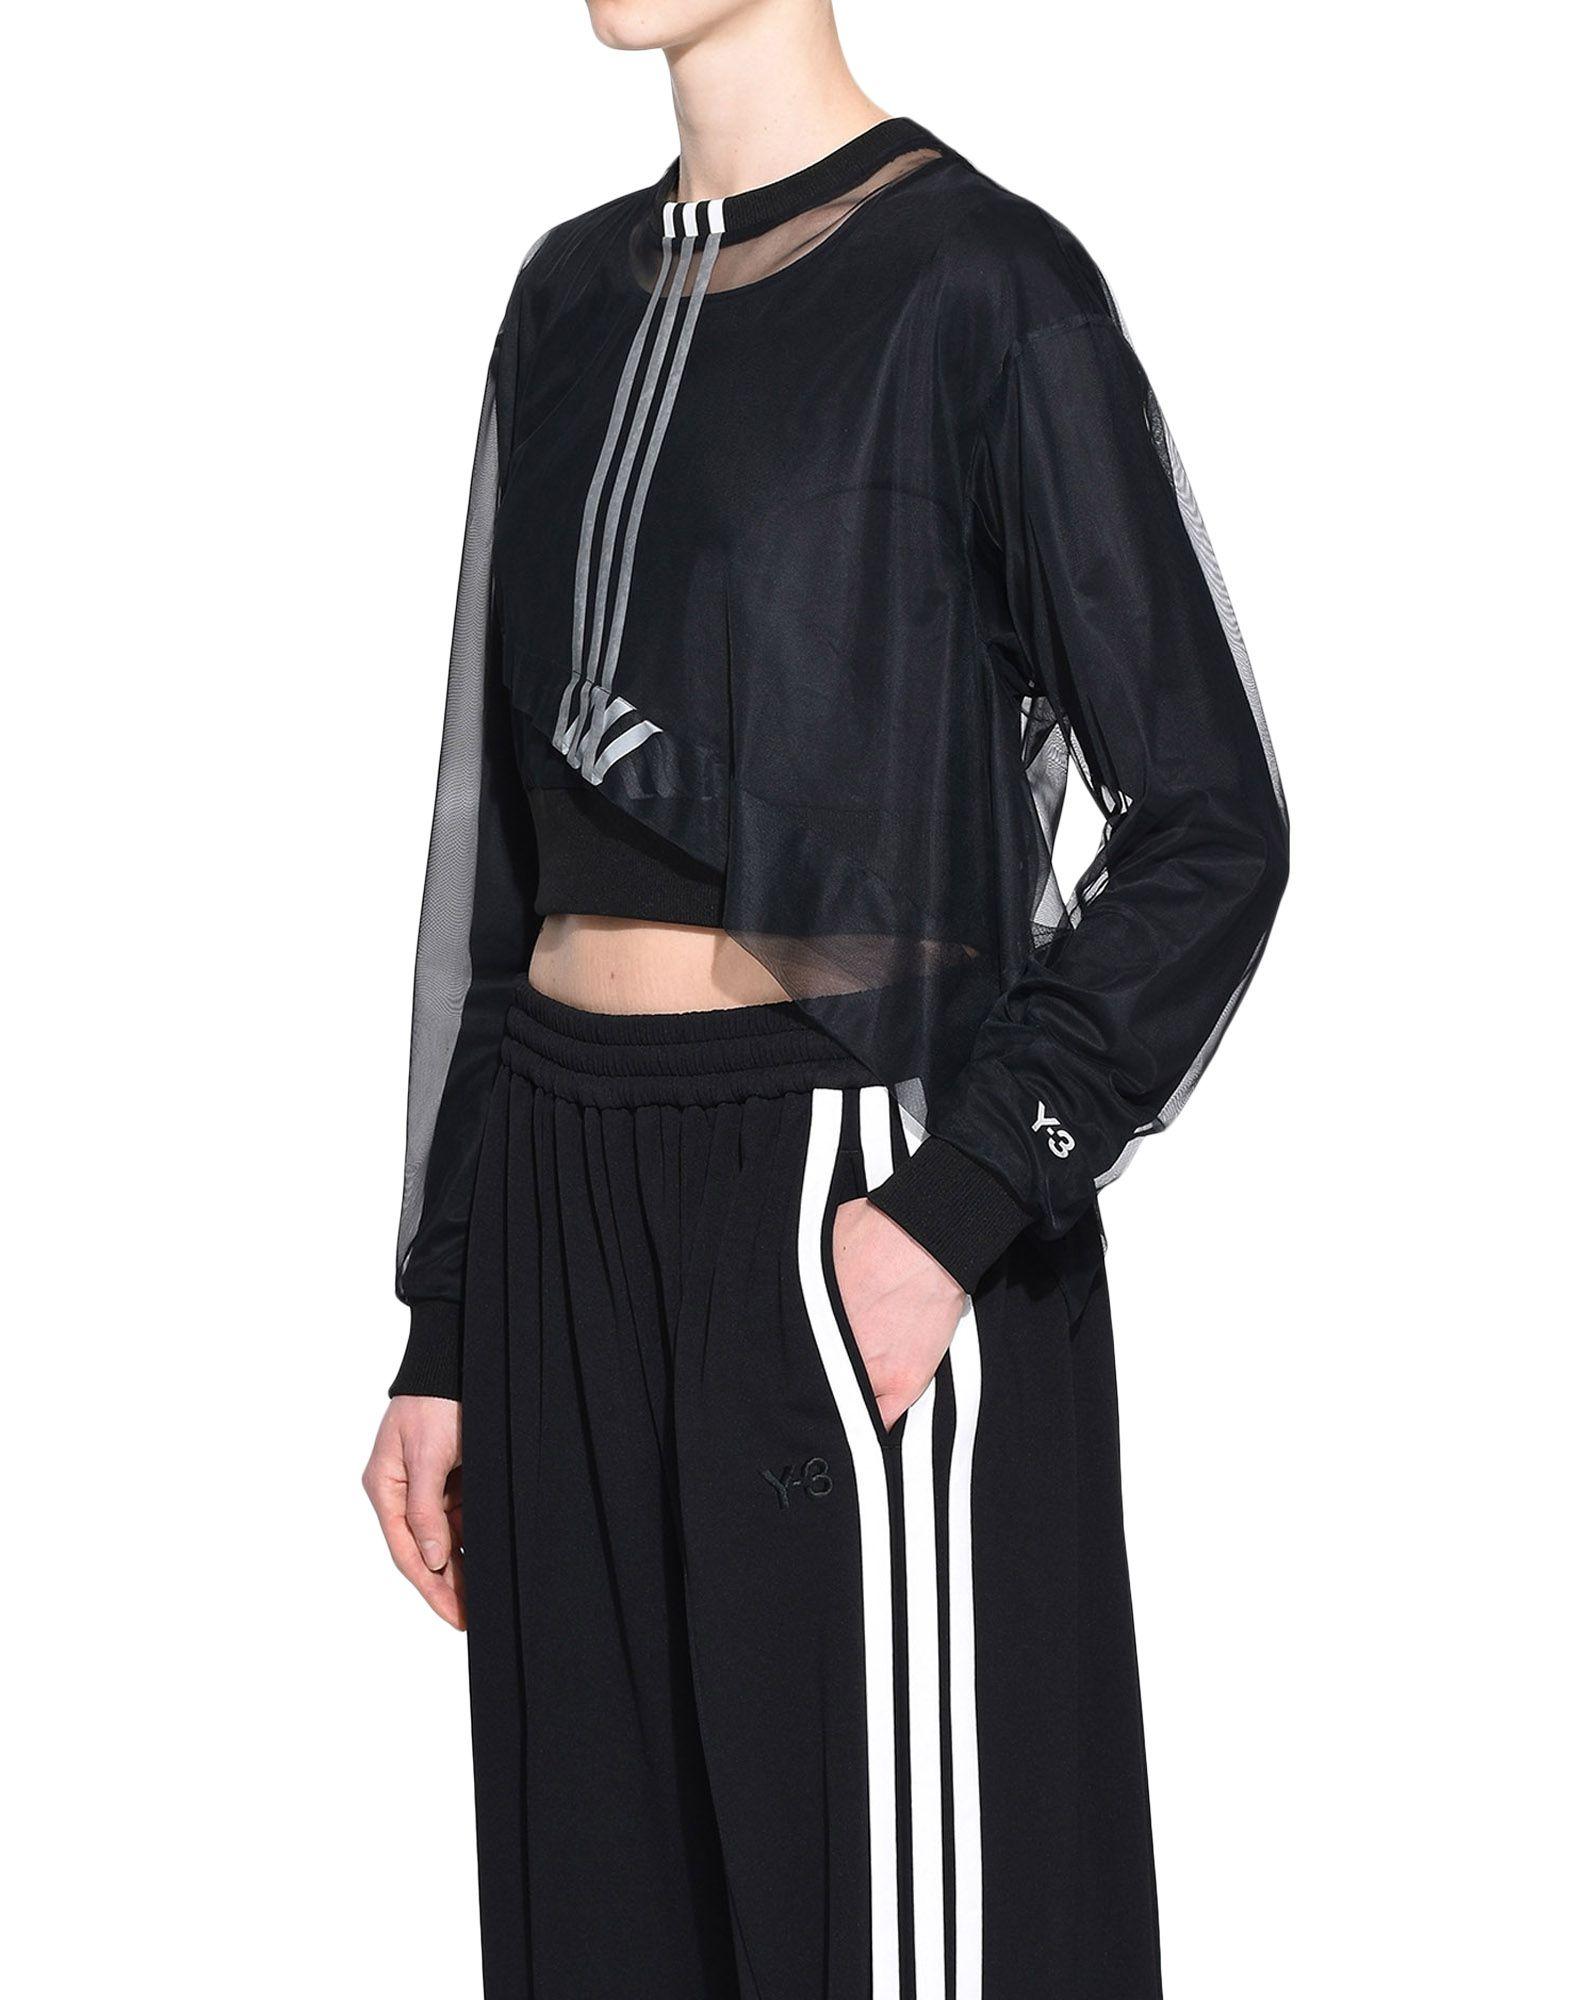 Y-3 Y-3 3-Stripes Mesh Cropped Tee Long sleeve t-shirt Woman e